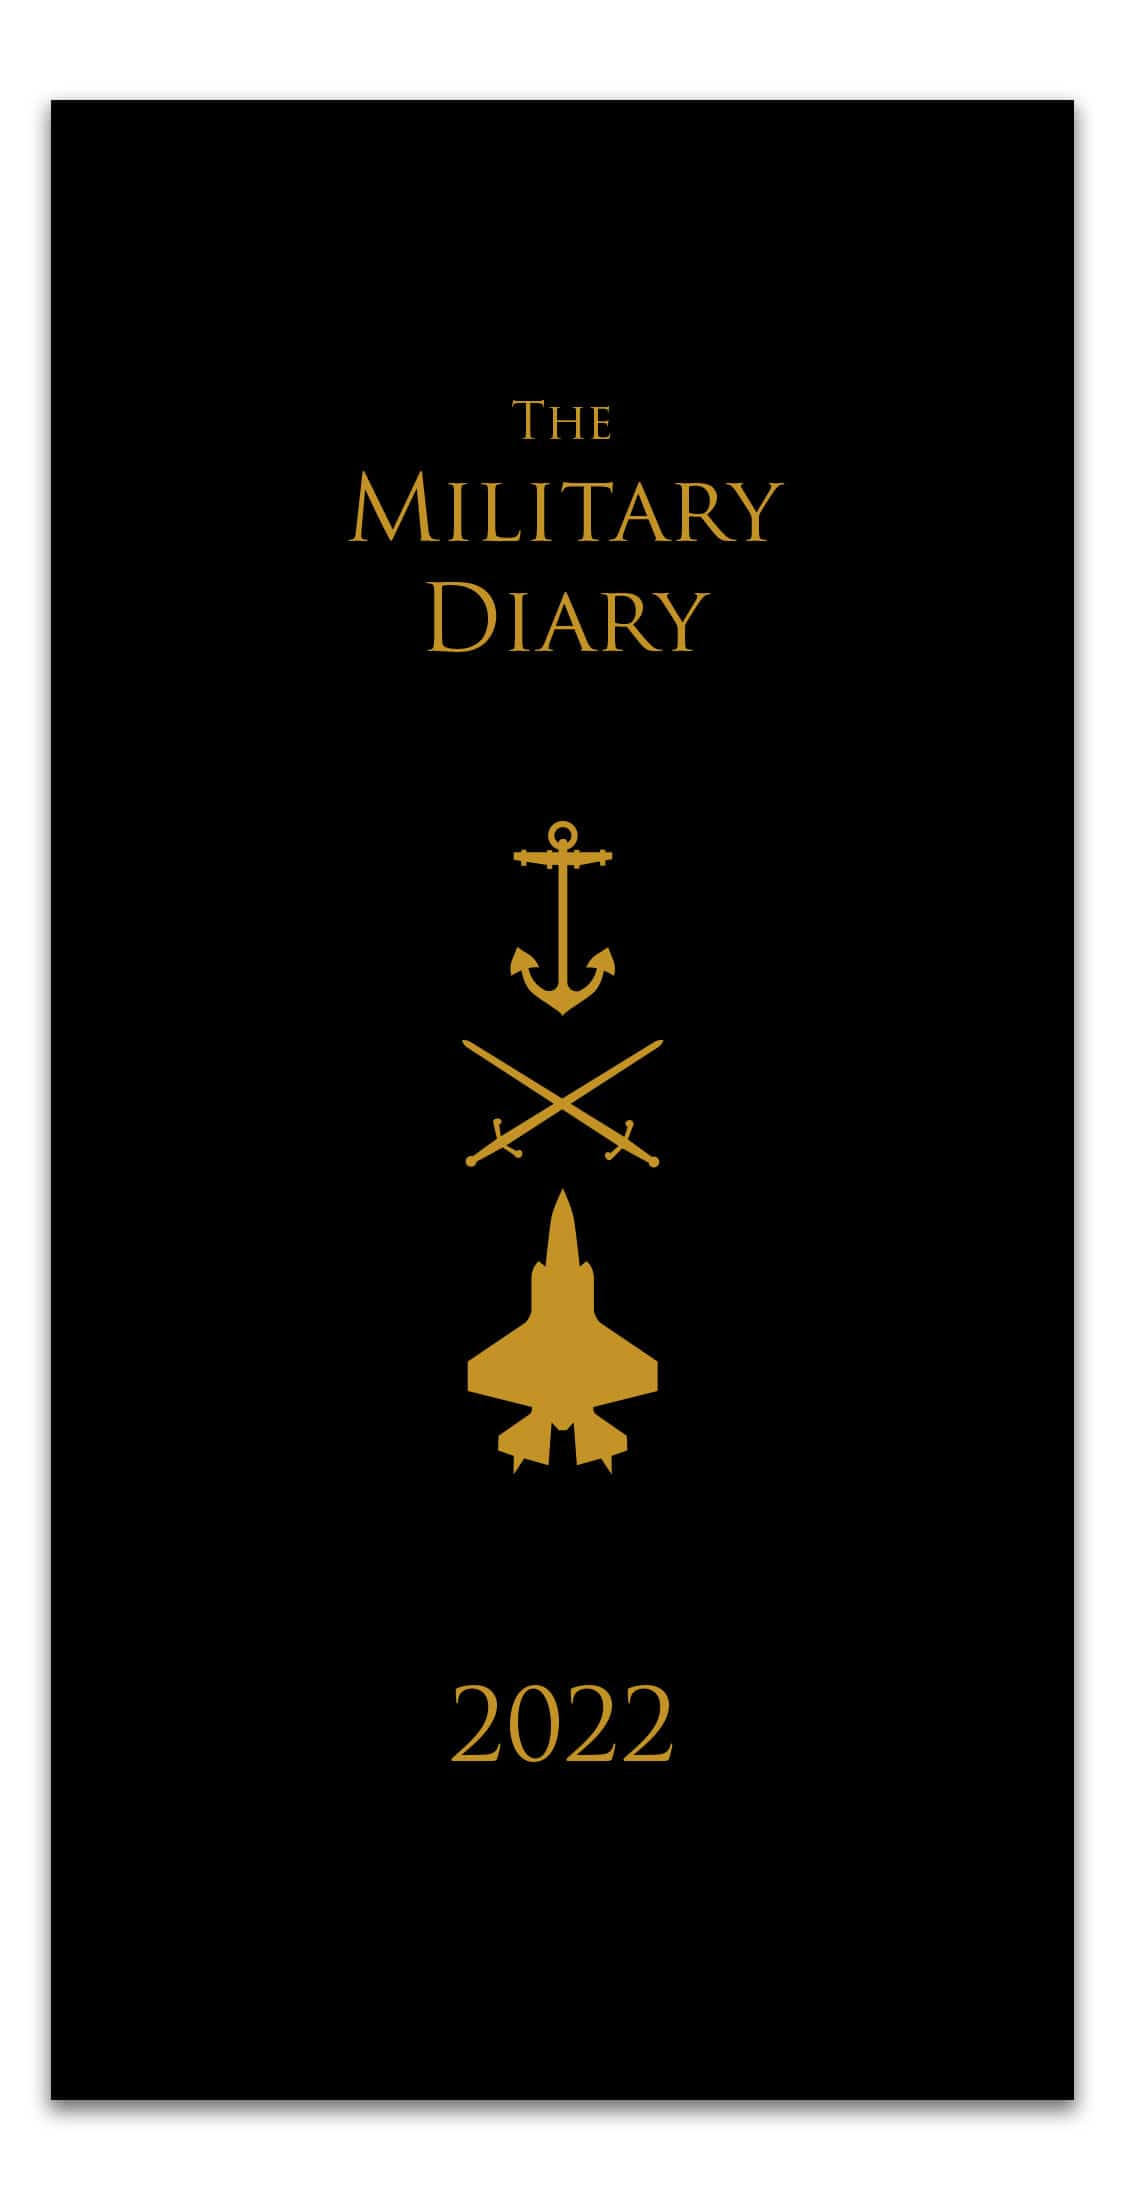 2022 The Military Diary